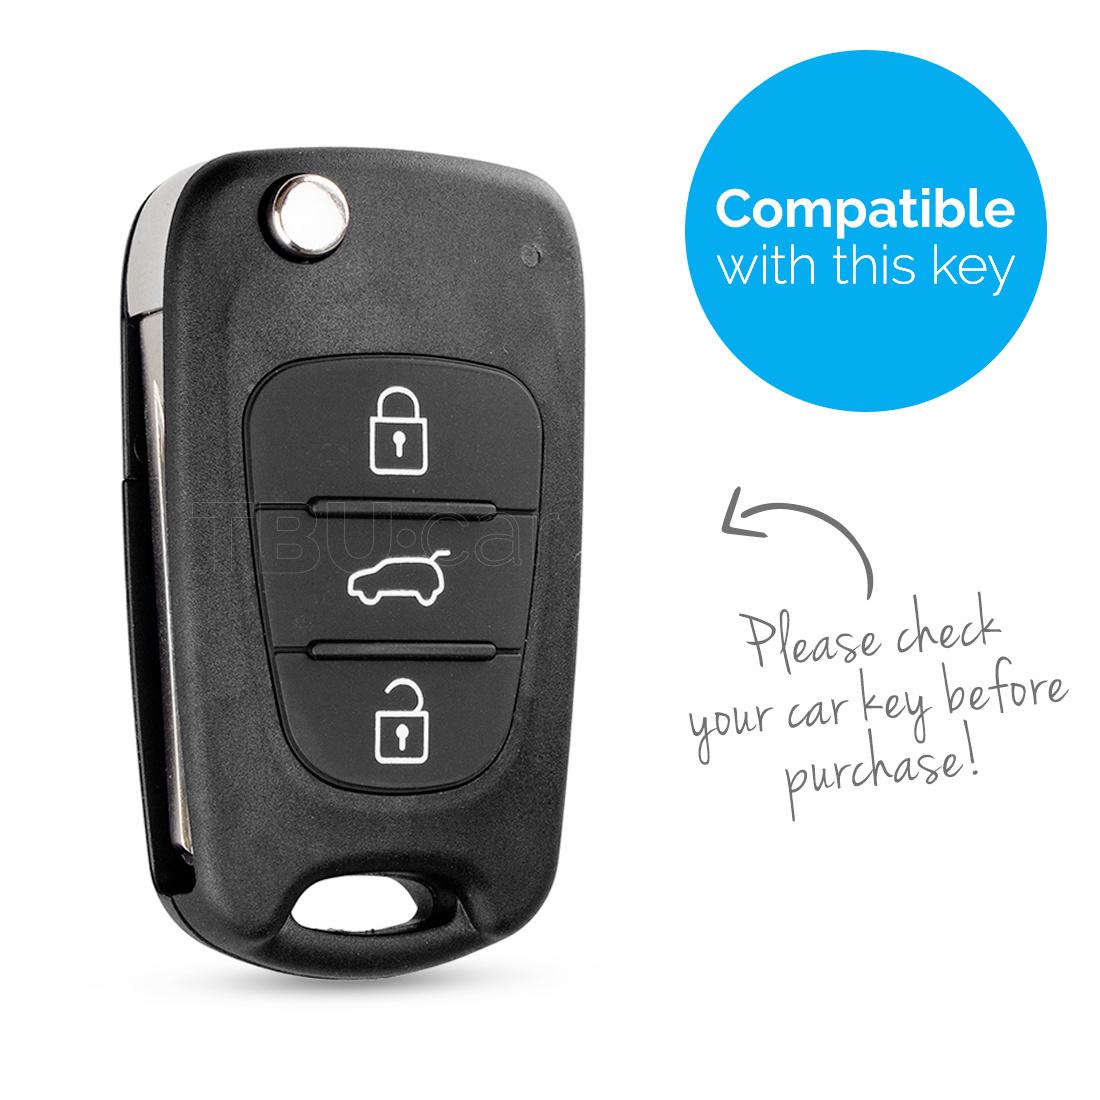 TBU car TBU car Autoschlüssel Hülle kompatibel mit Kia 3 Tasten - Schutzhülle aus Silikon - Auto Schlüsselhülle Cover in Lindgrün